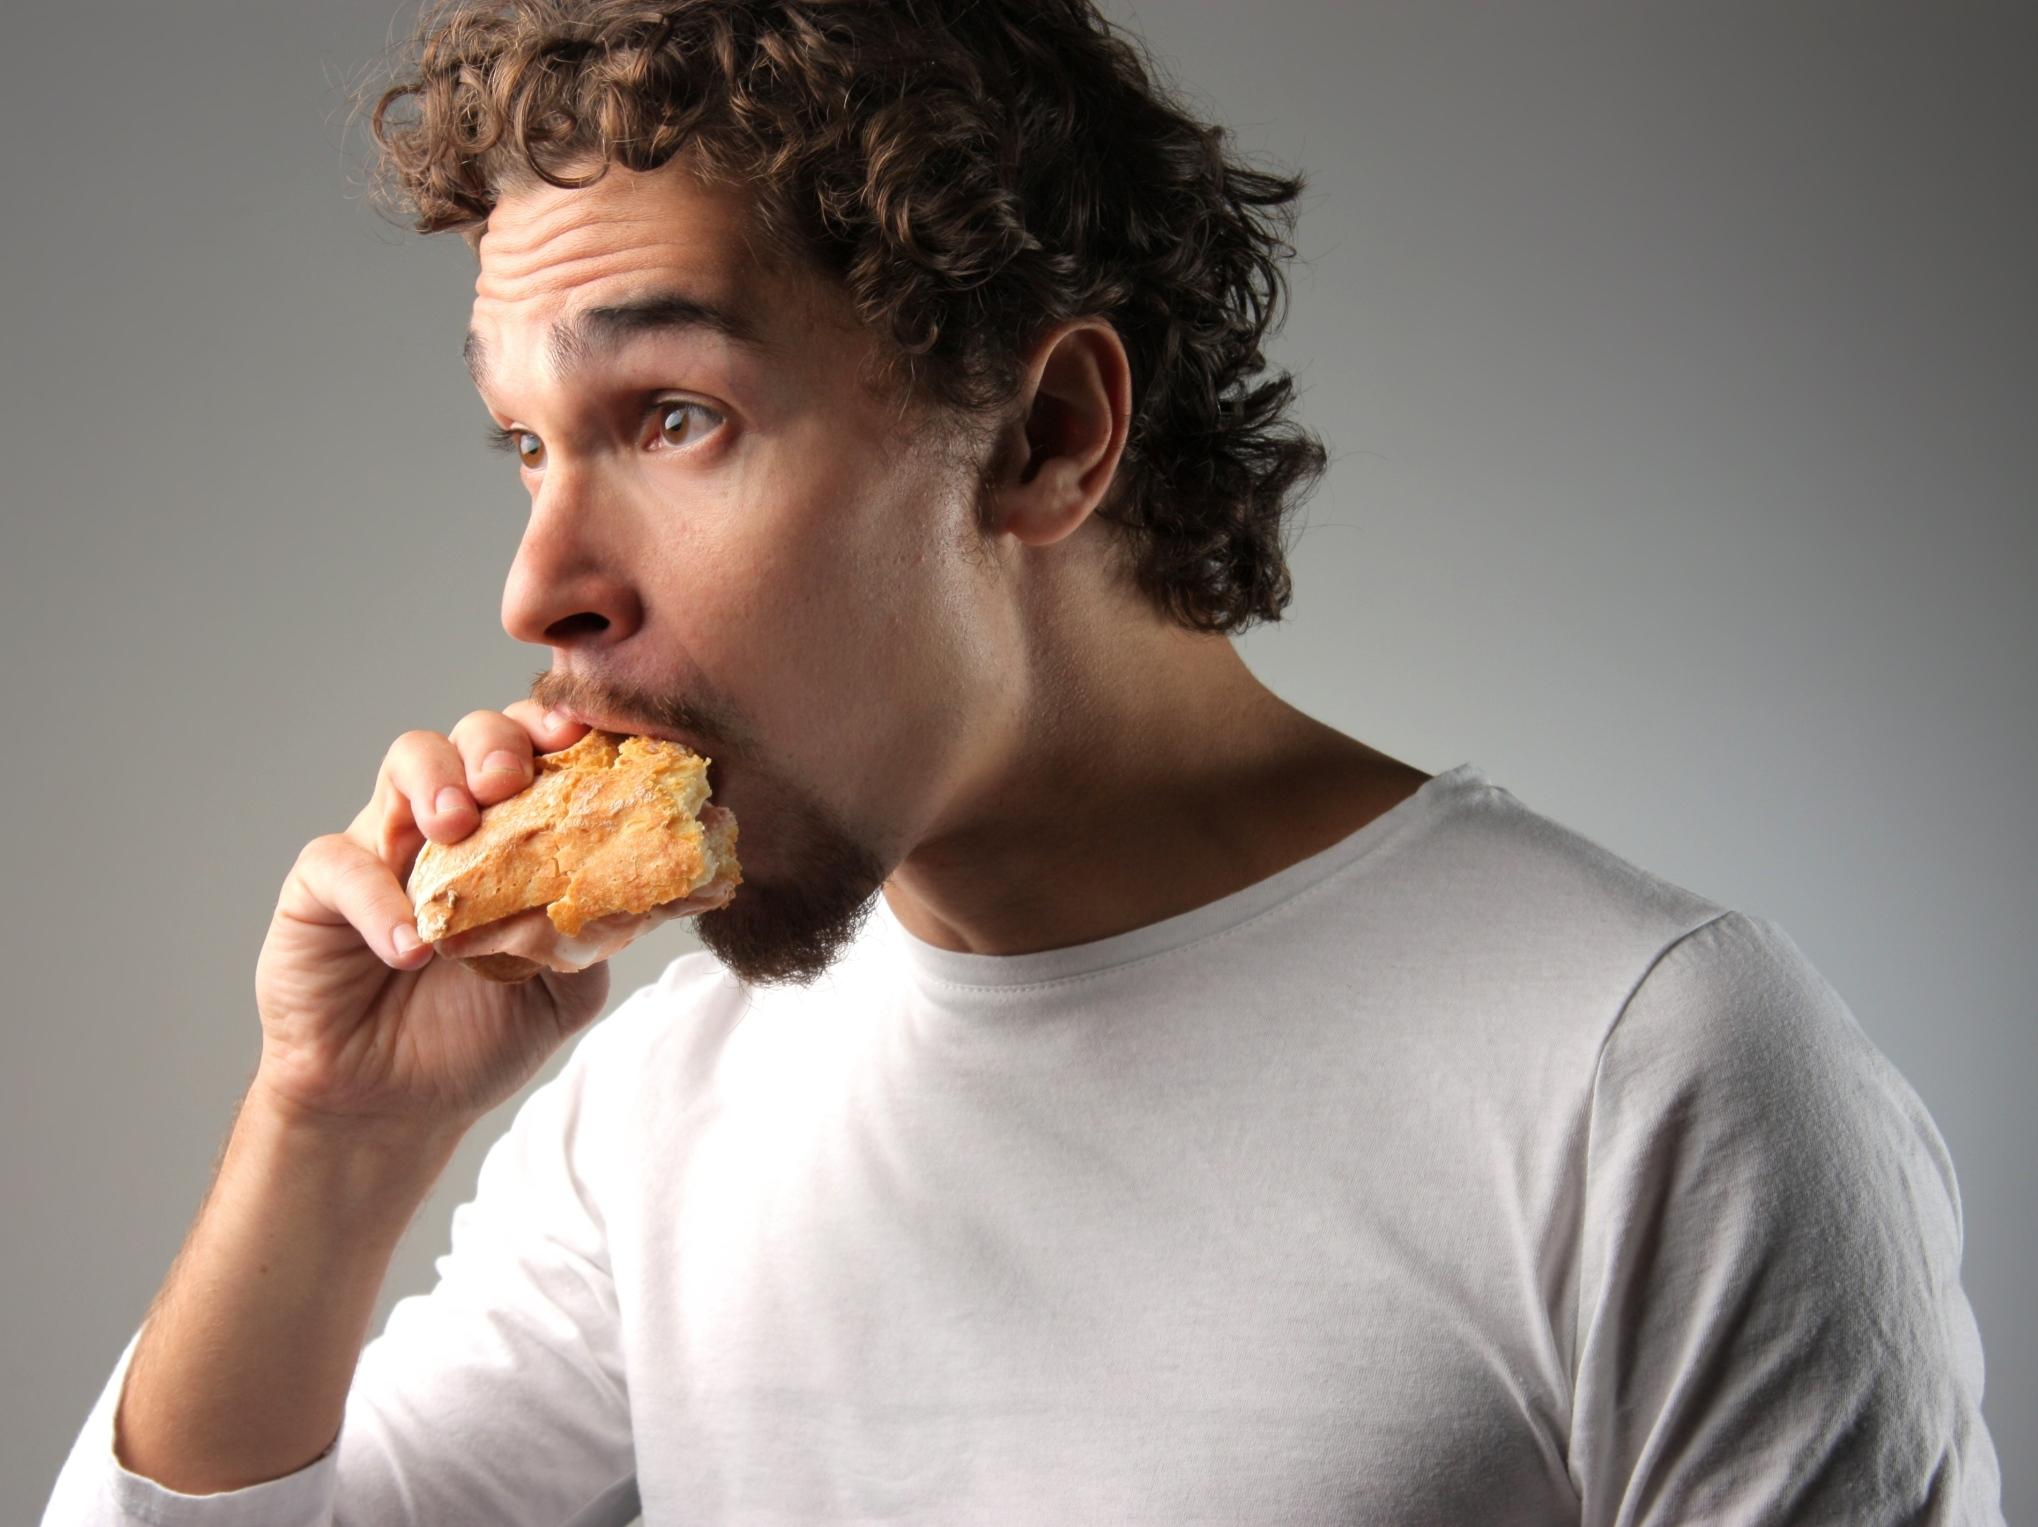 обязаны, картинки мужчины едят как оказалось, красива